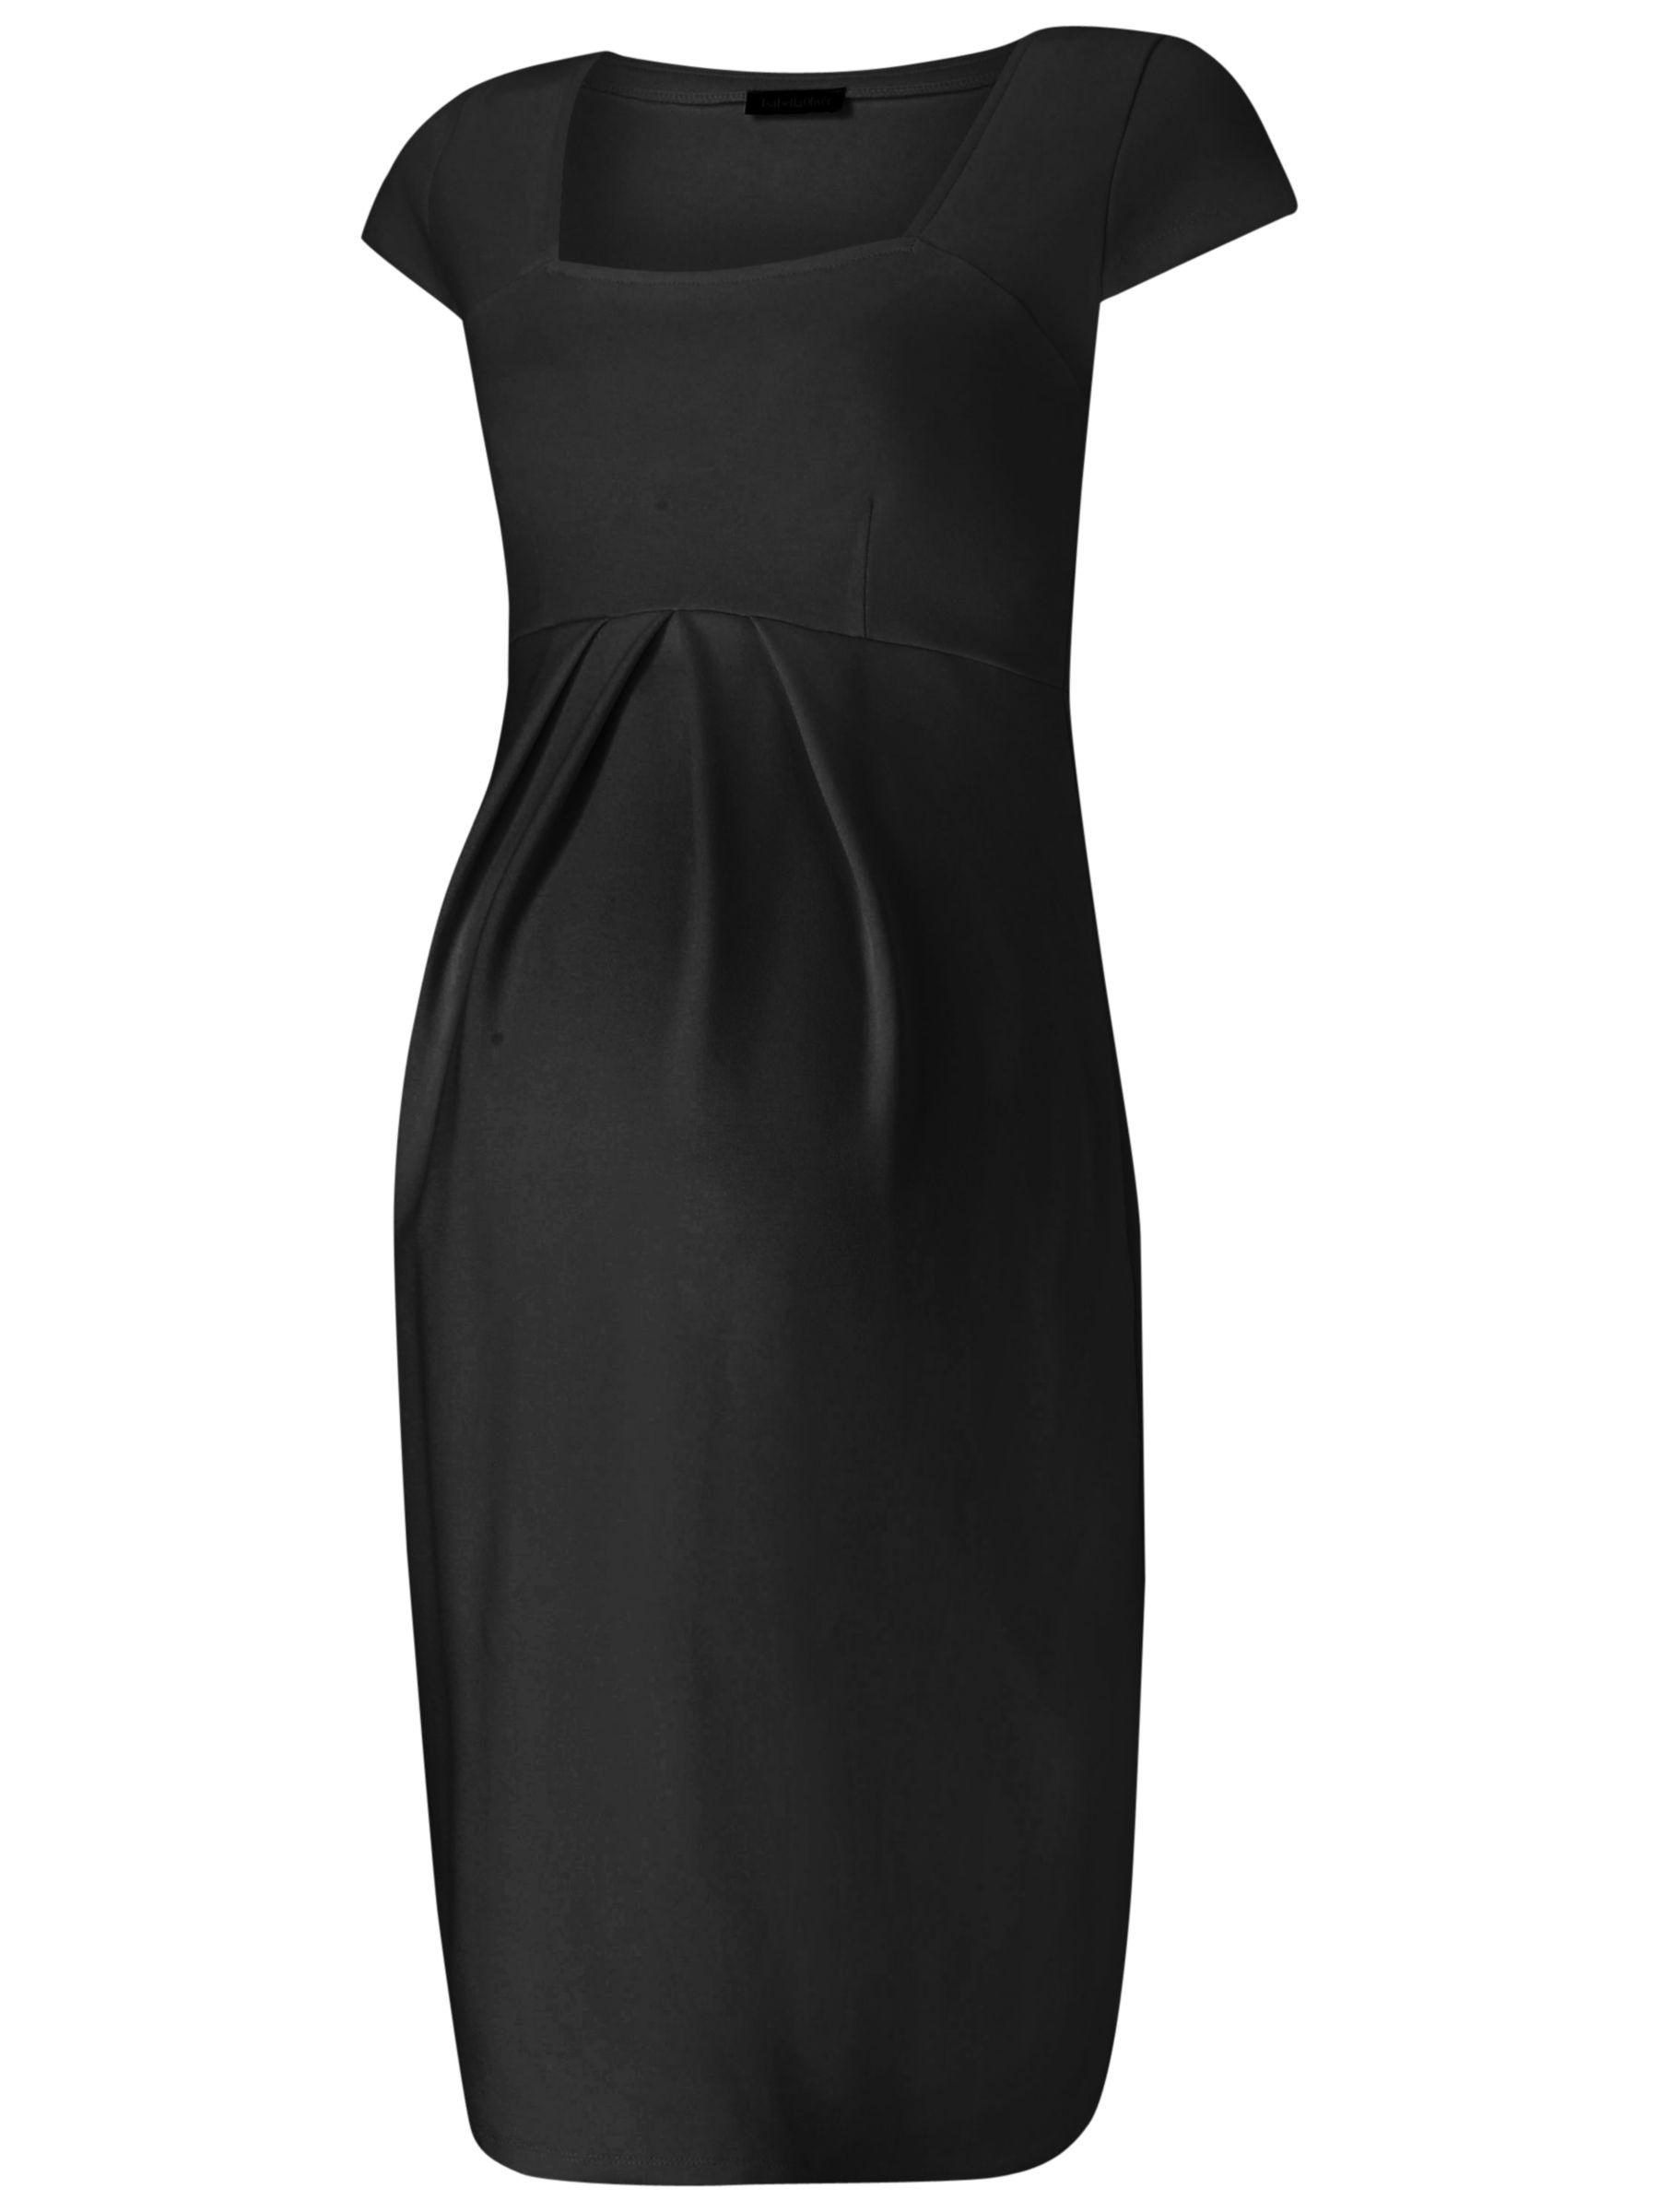 Isabella Oliver Isabella Oliver Farah Shift Maternity Dress, Caviar Black